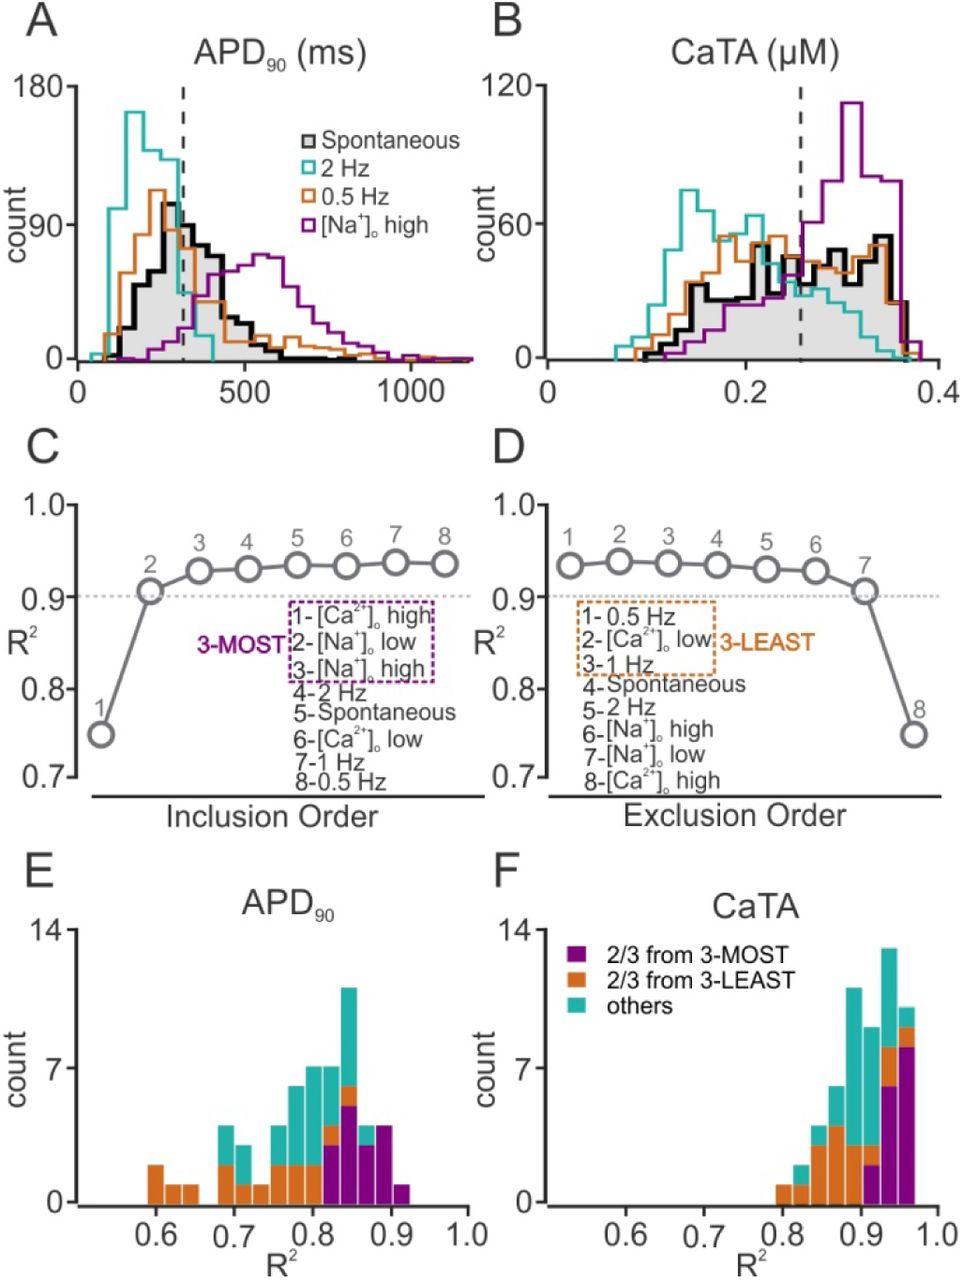 Population-based mechanistic modeling allows for quantitative